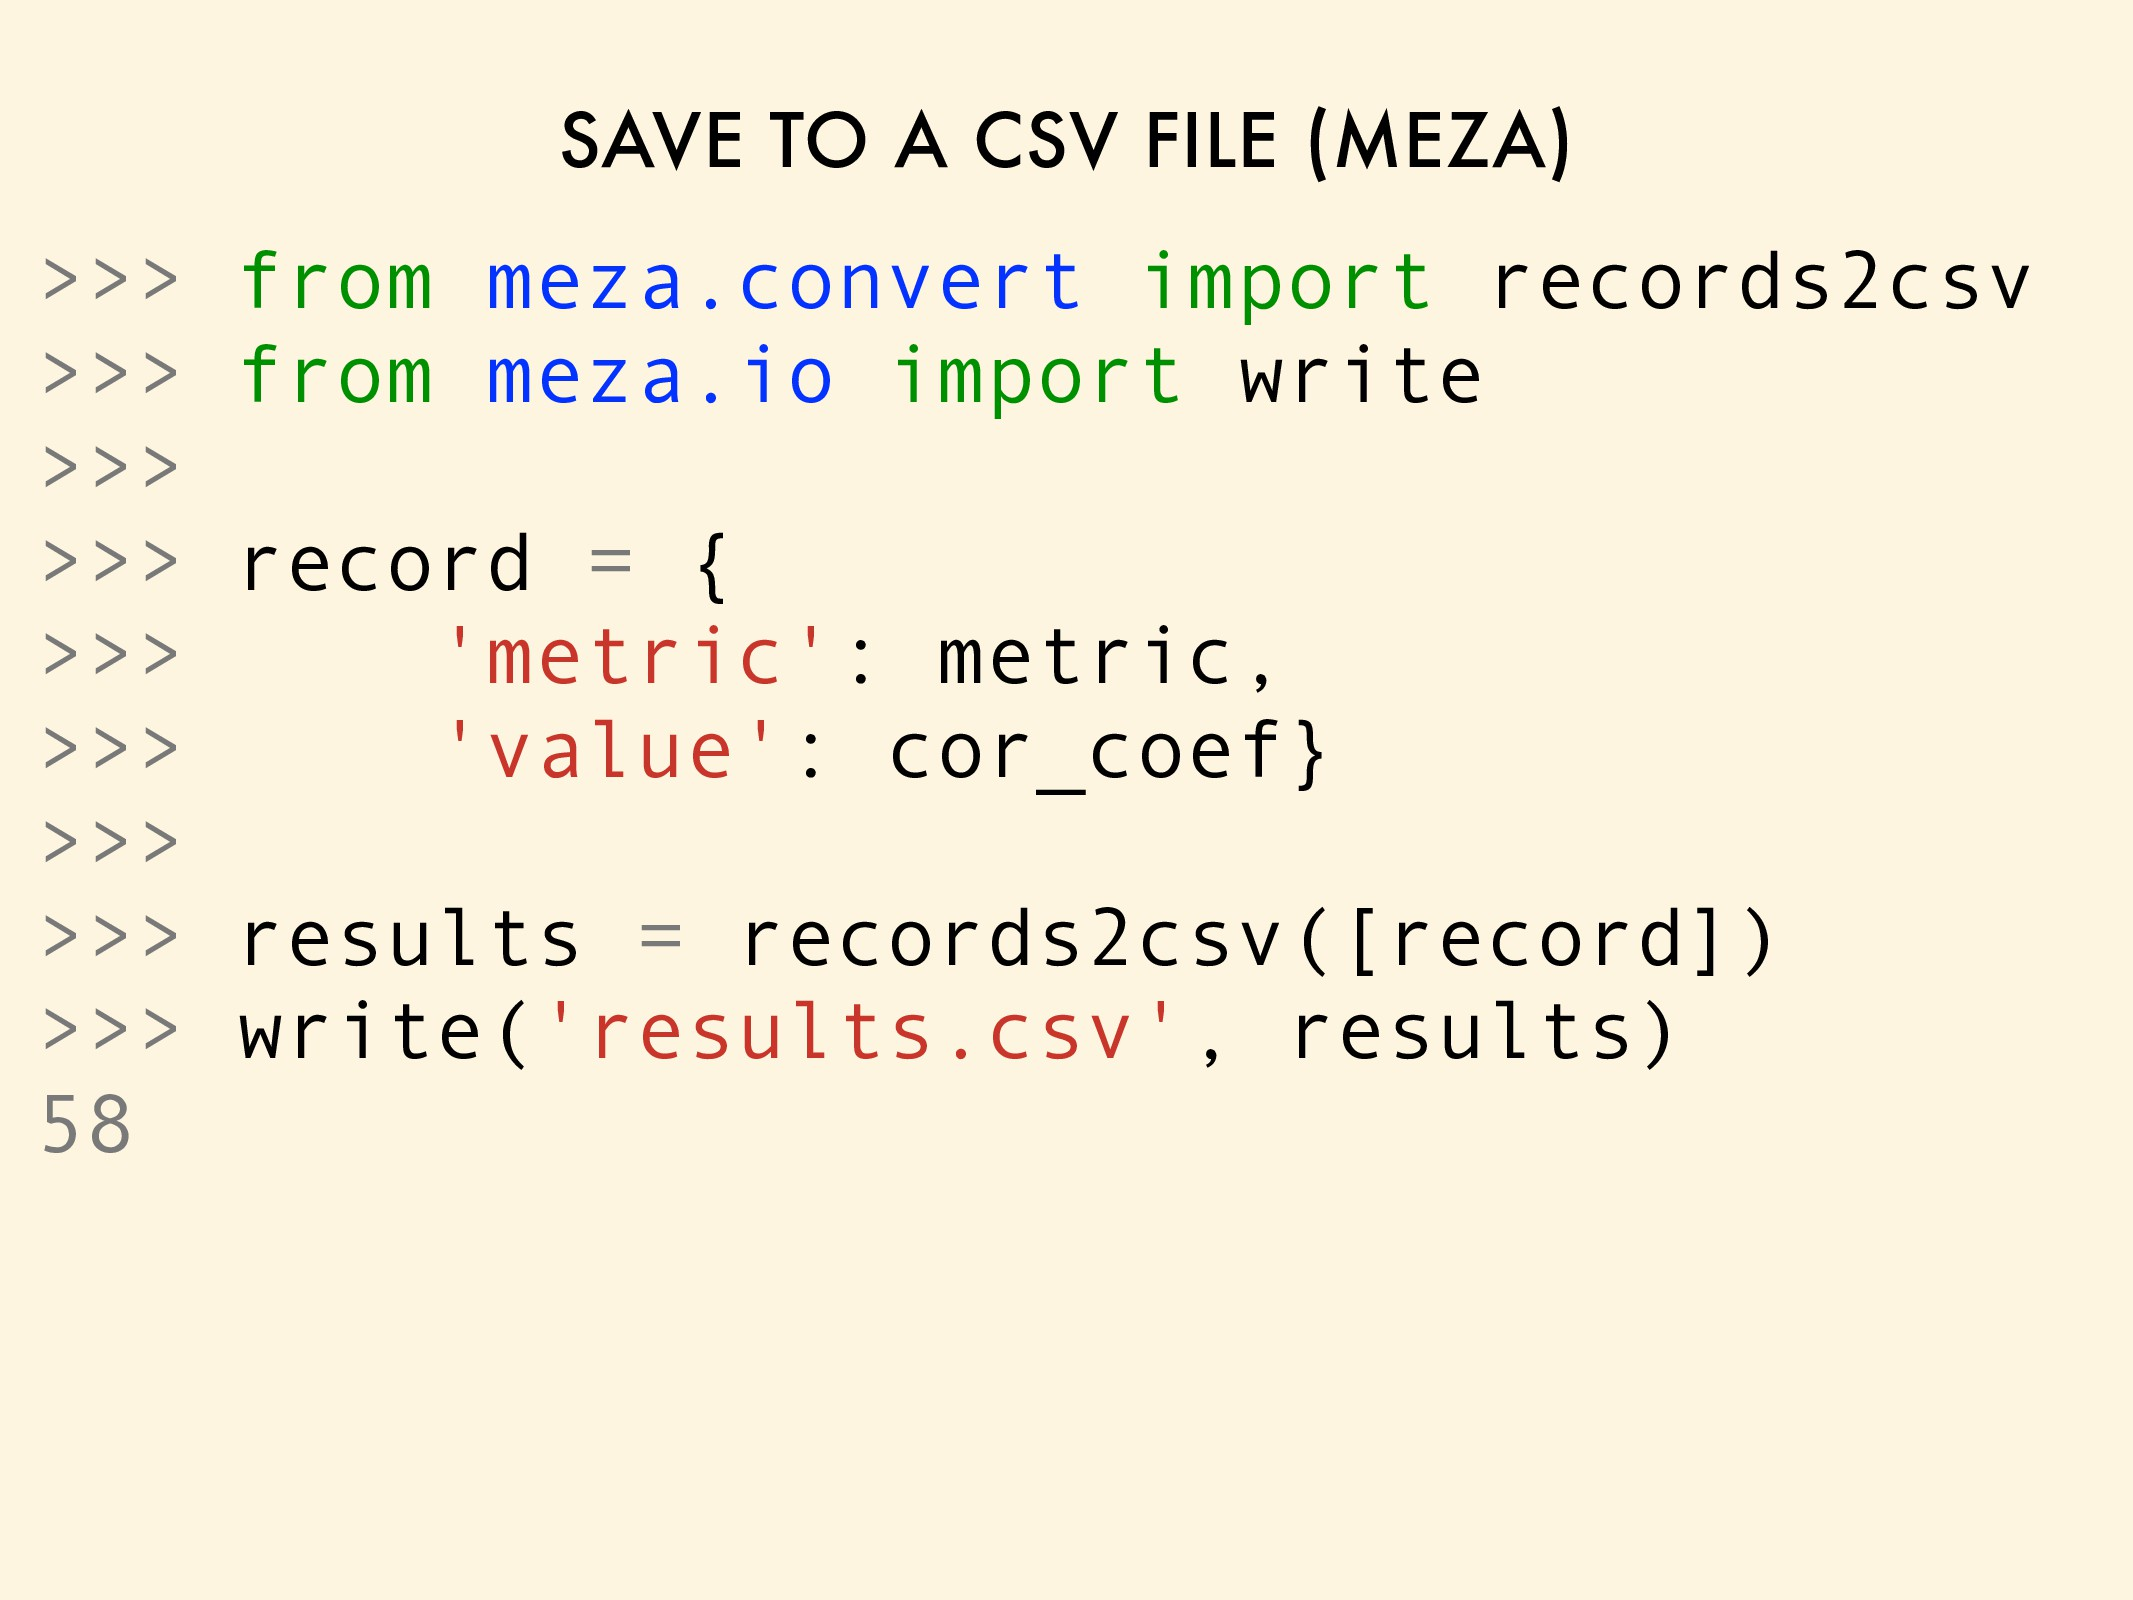 SAVE TO A CSV FILE (MEZA) >>> from meza.convert...